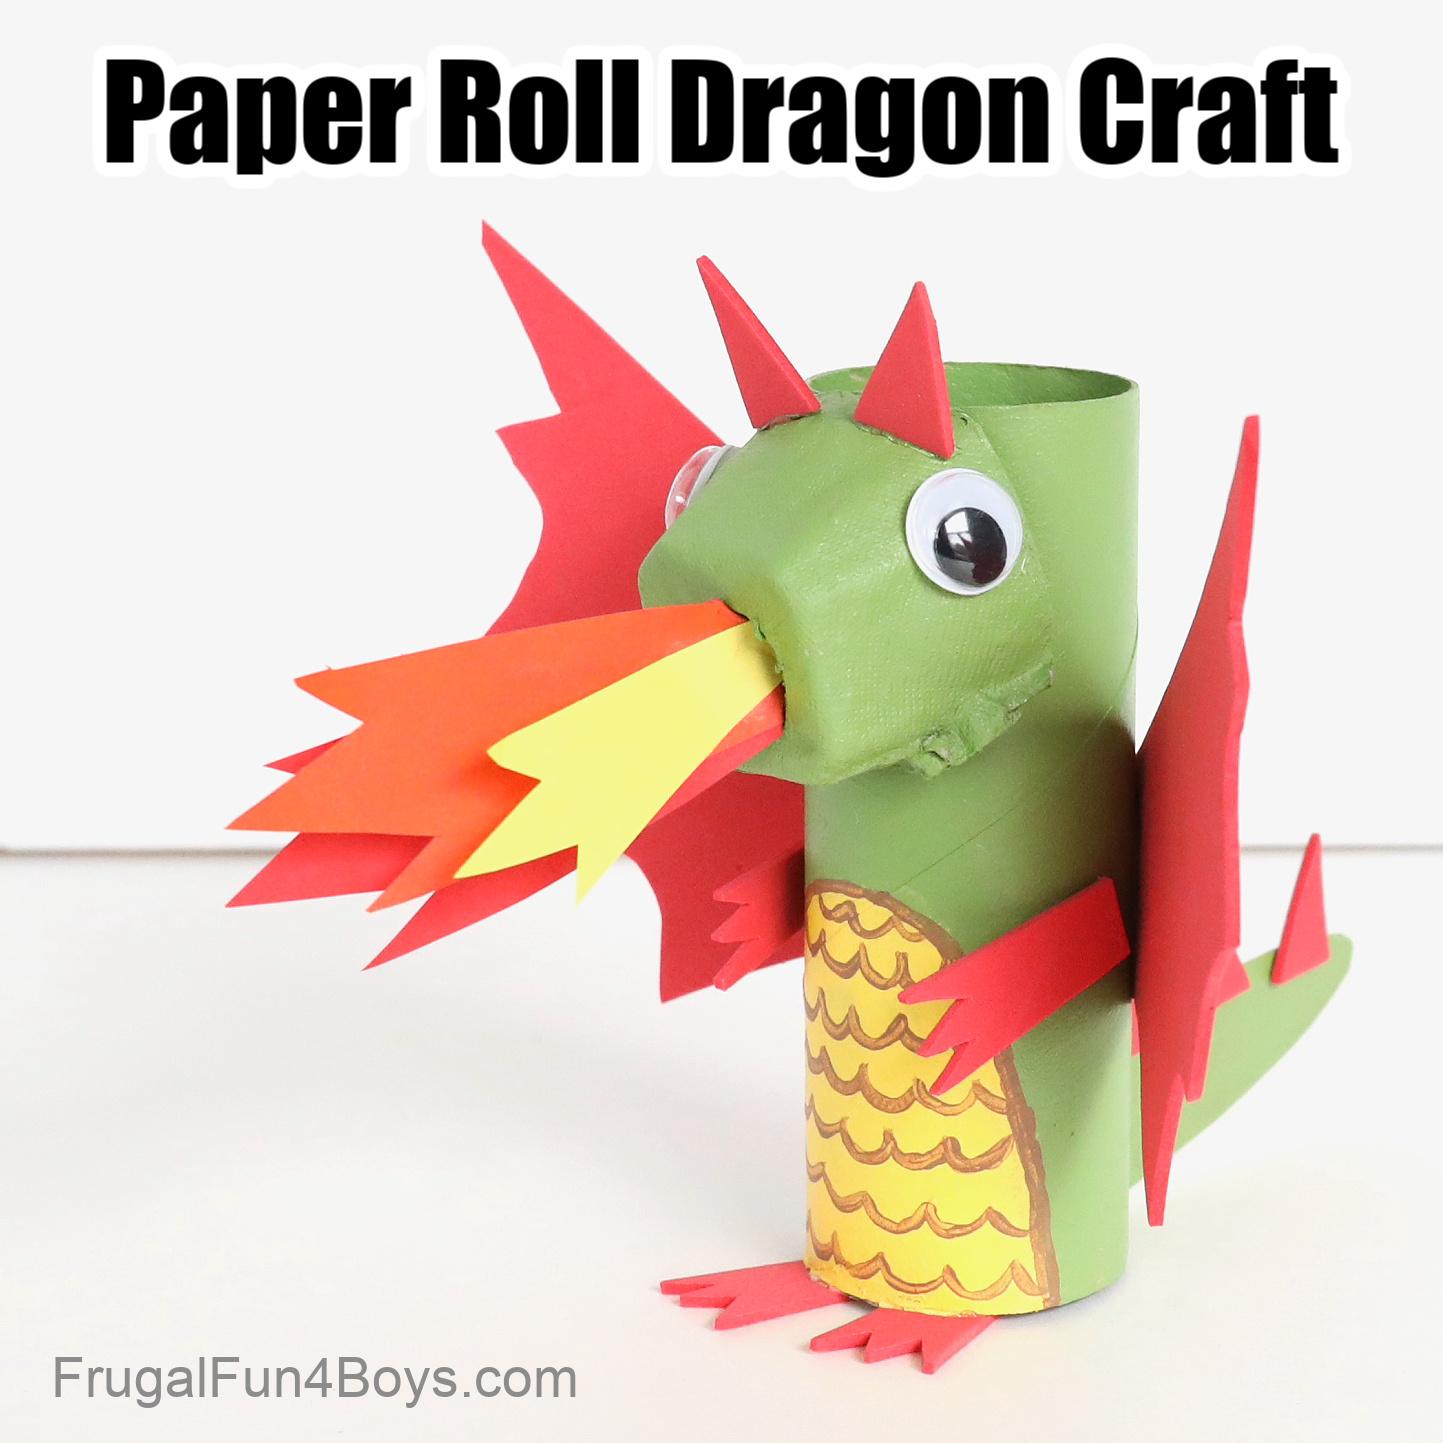 Paper Roll Dragon Craft